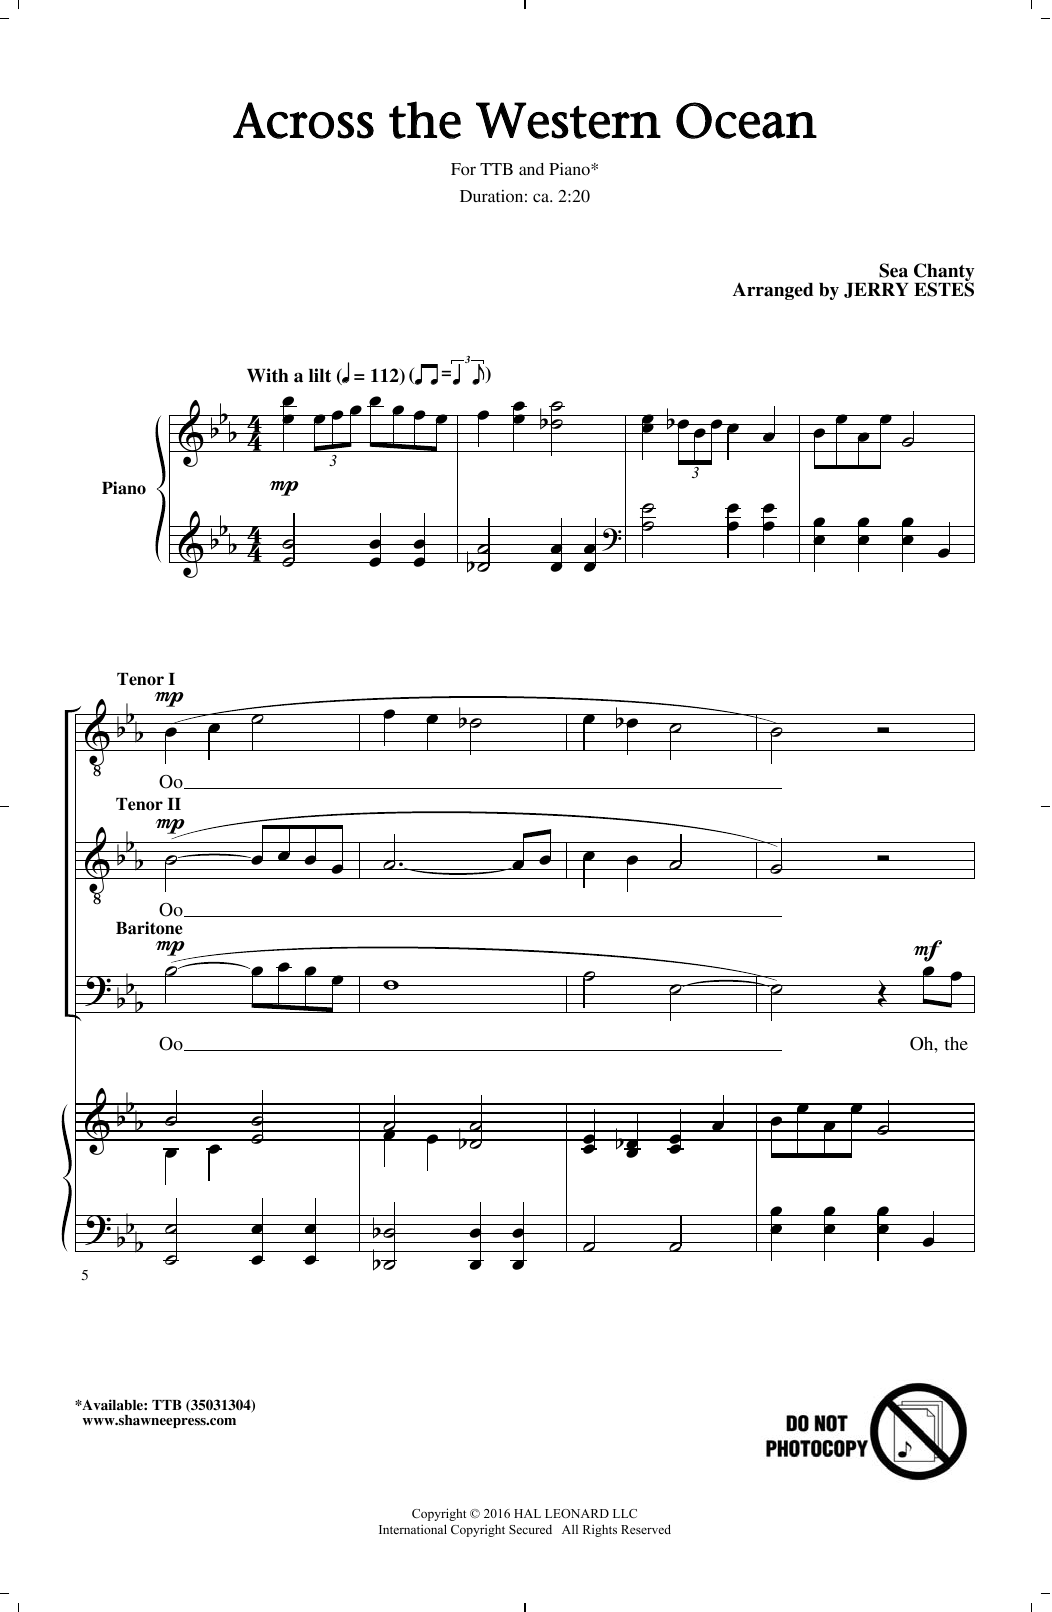 Across The Western Ocean sheet music